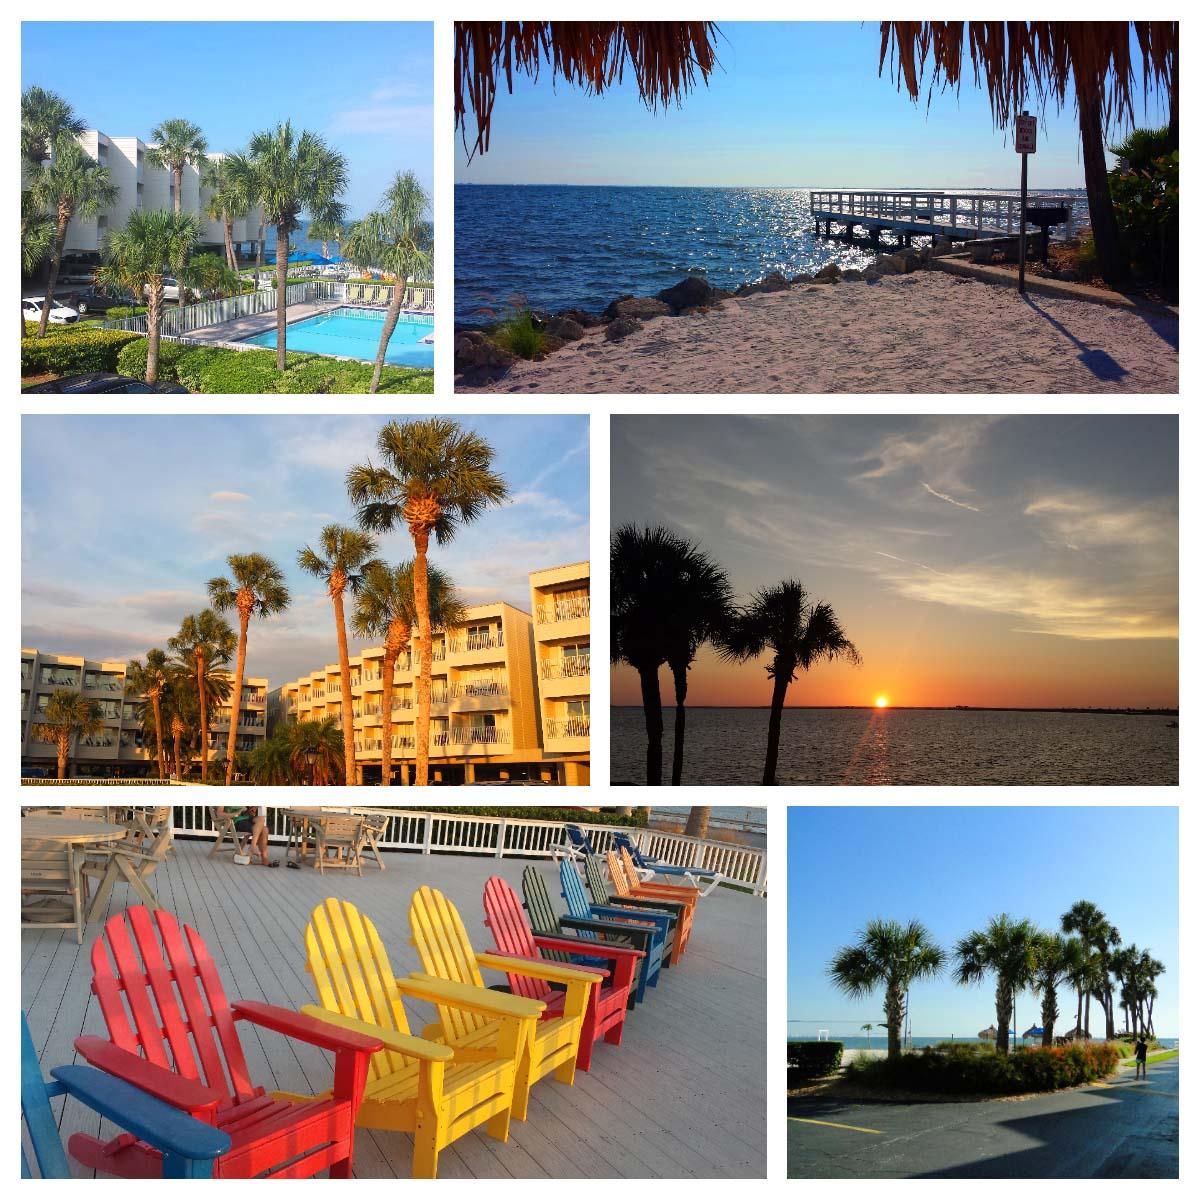 Hotel em Tampa: Sailport Waterfront Suítes